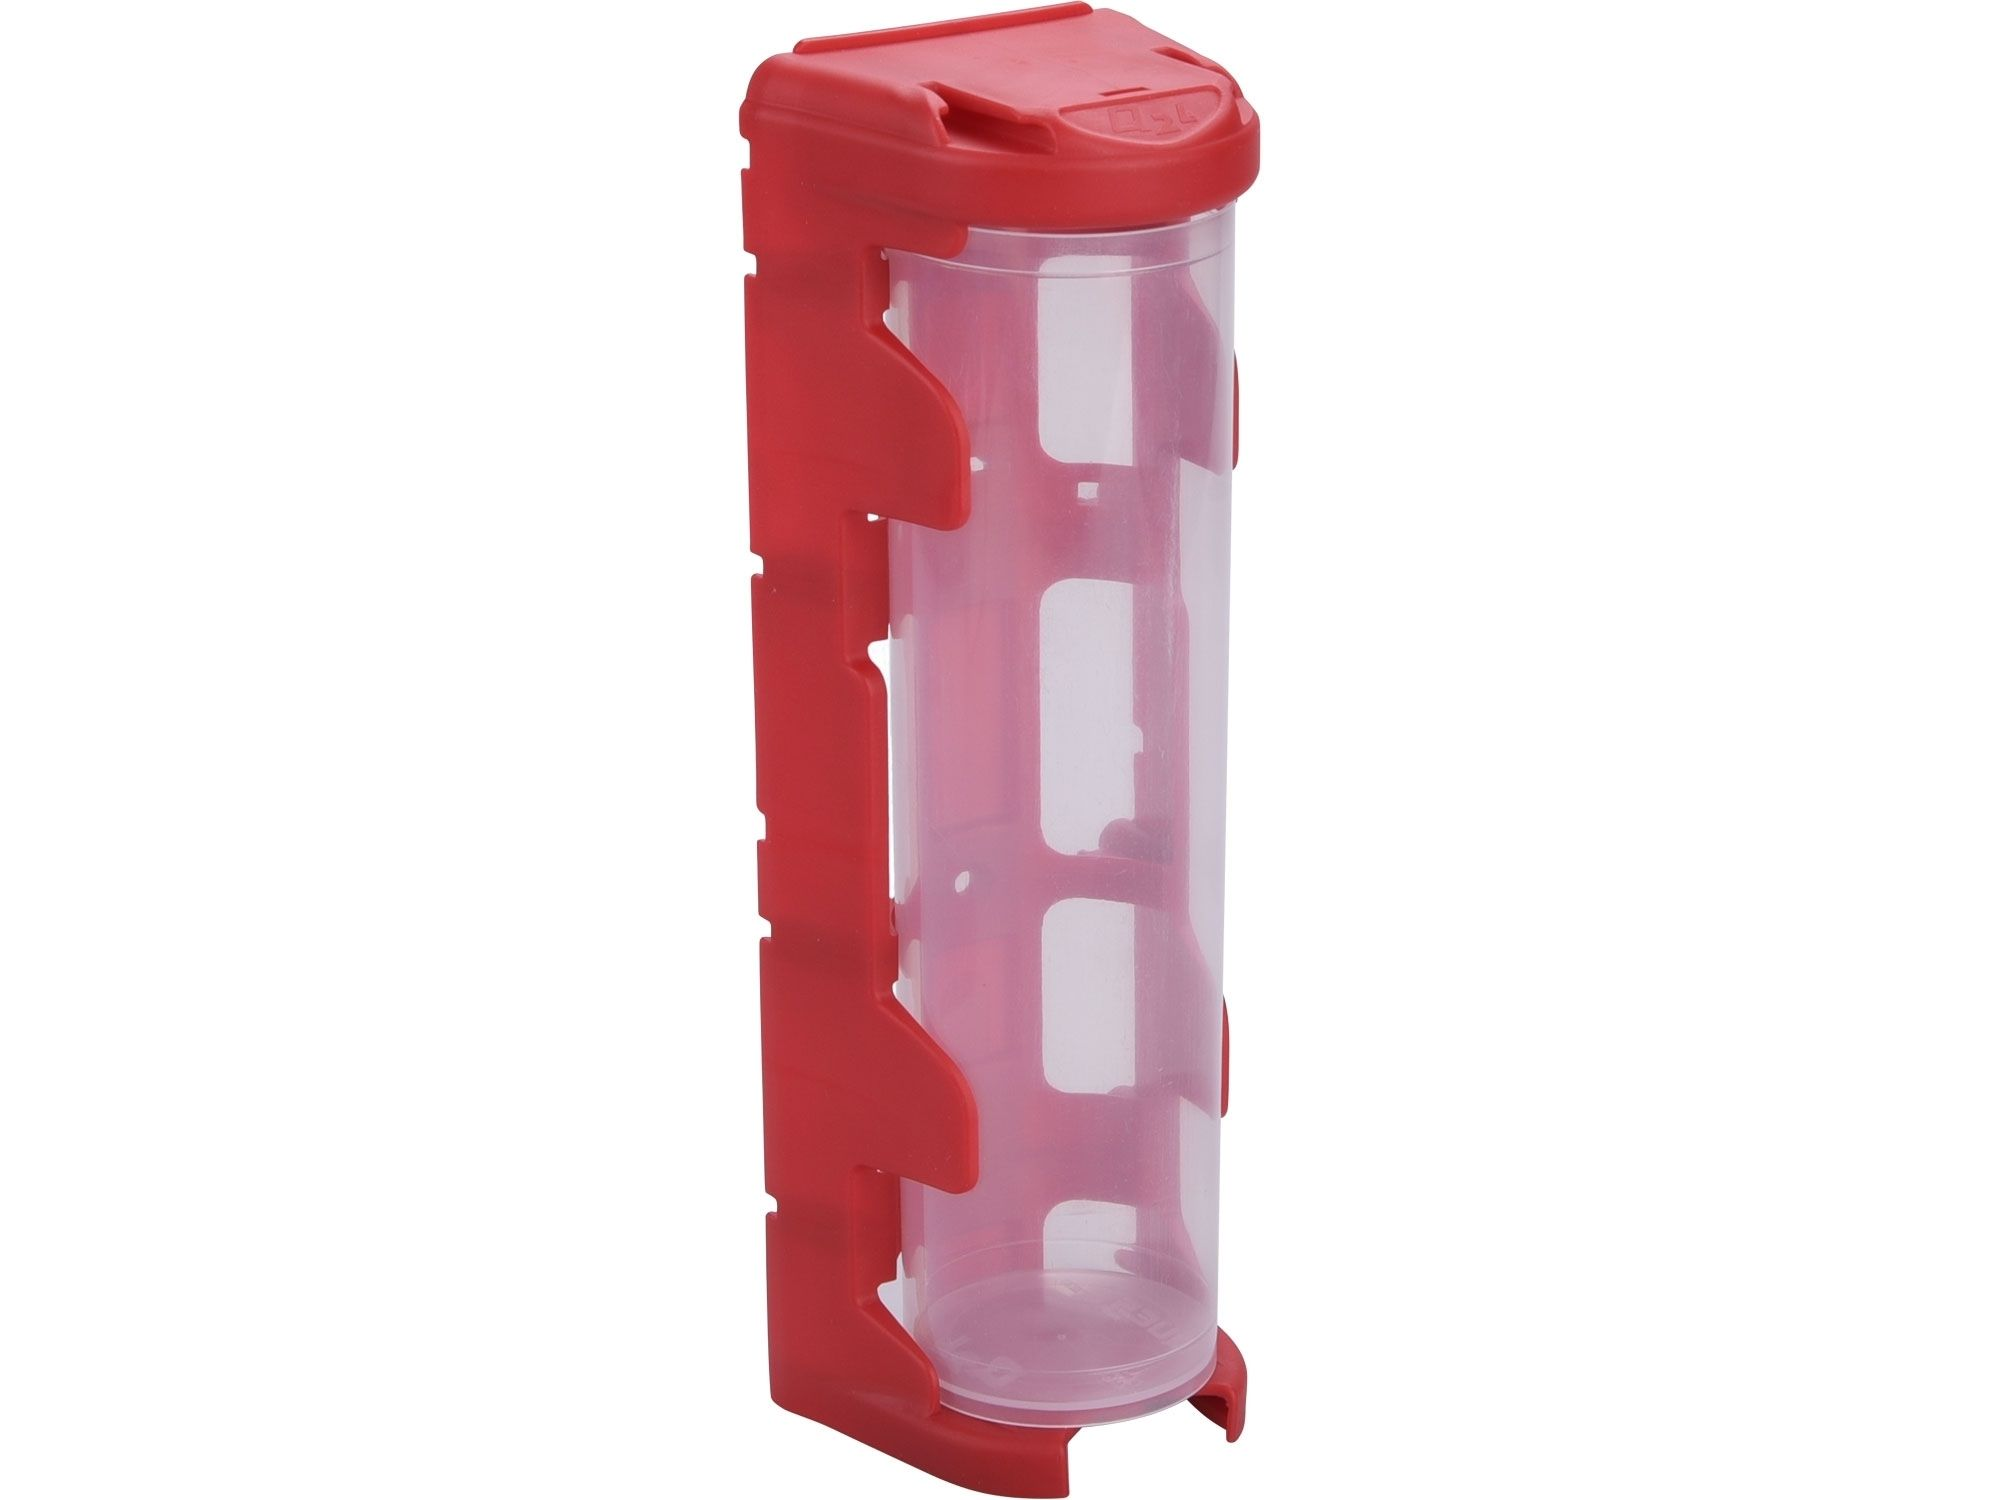 Organizér modulový závěsný - červený, LONG (420ml), PP EXTOL CRAFT